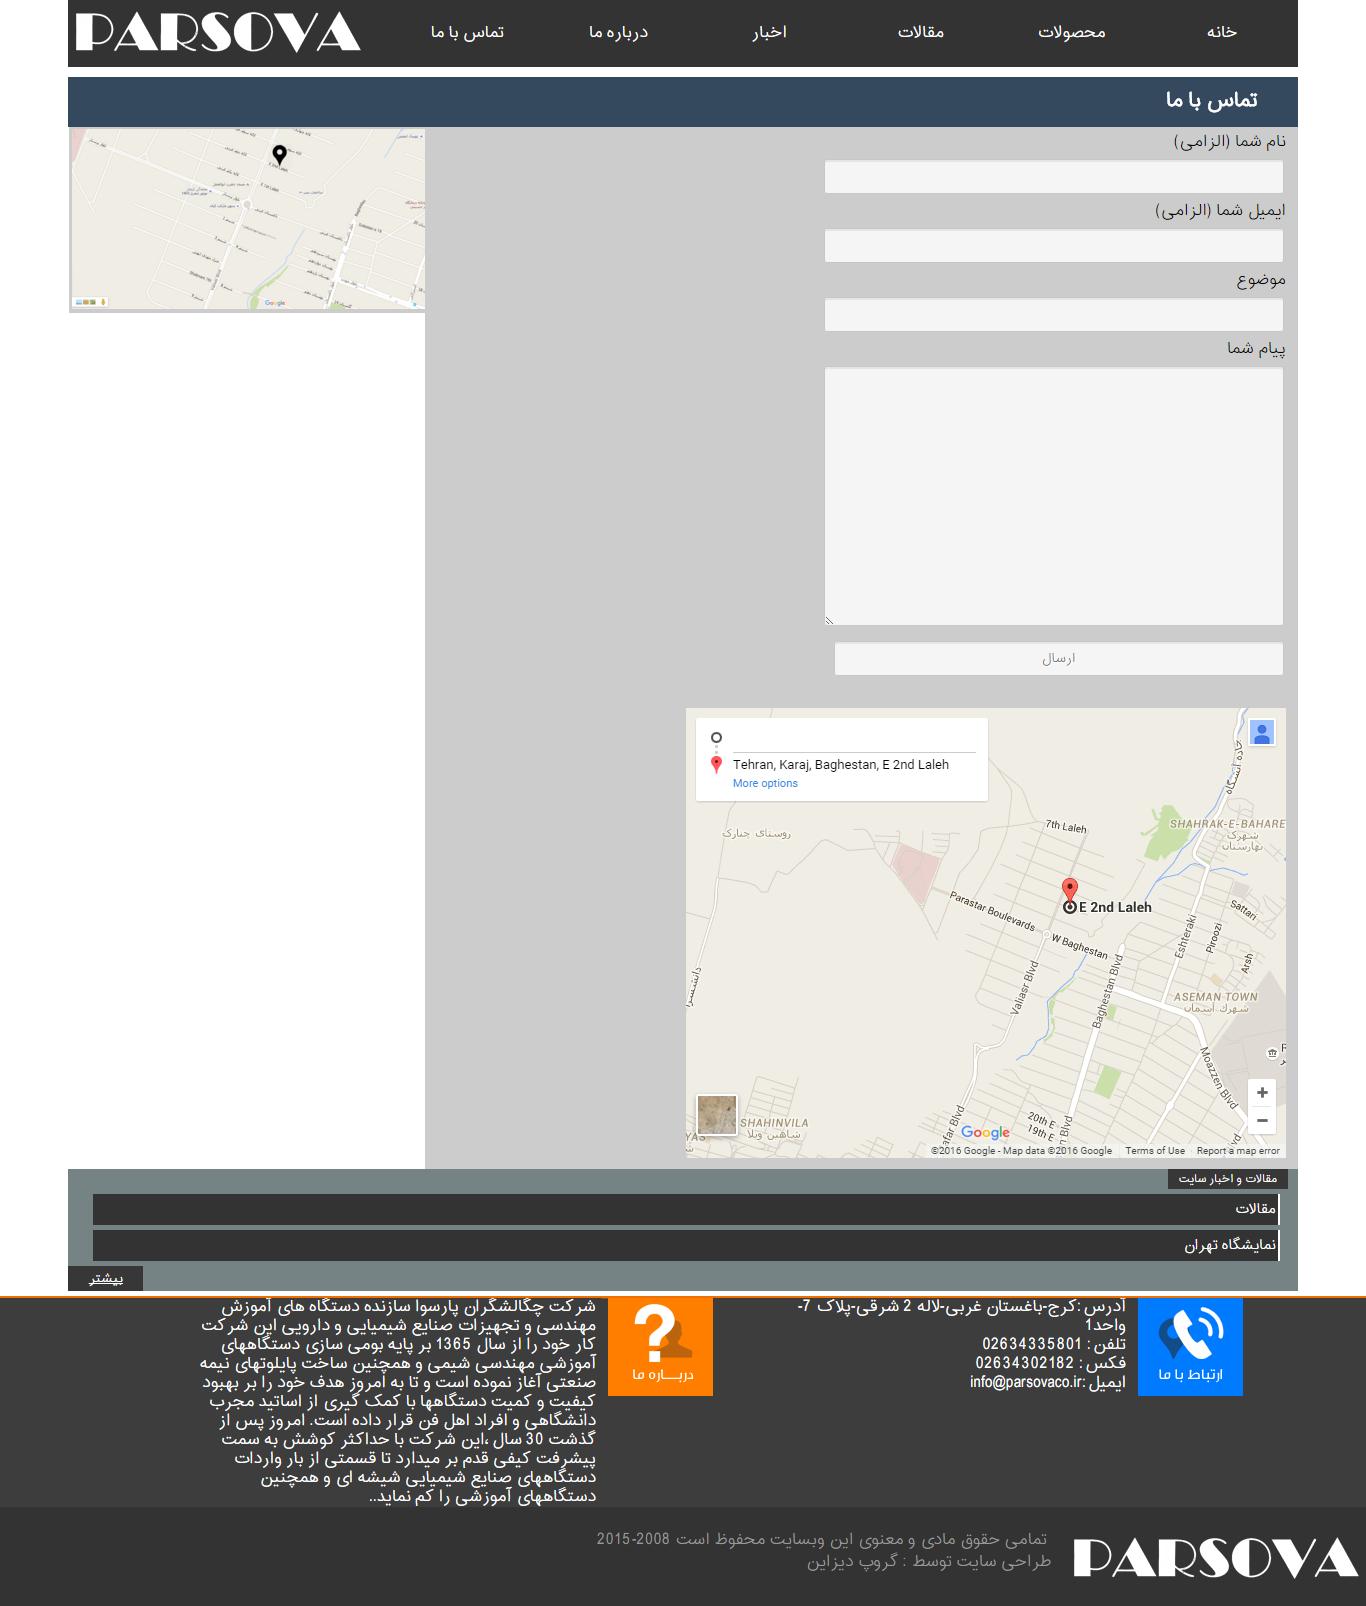 parsova2 طراحی سایت آزمایشگاهی پارسوا